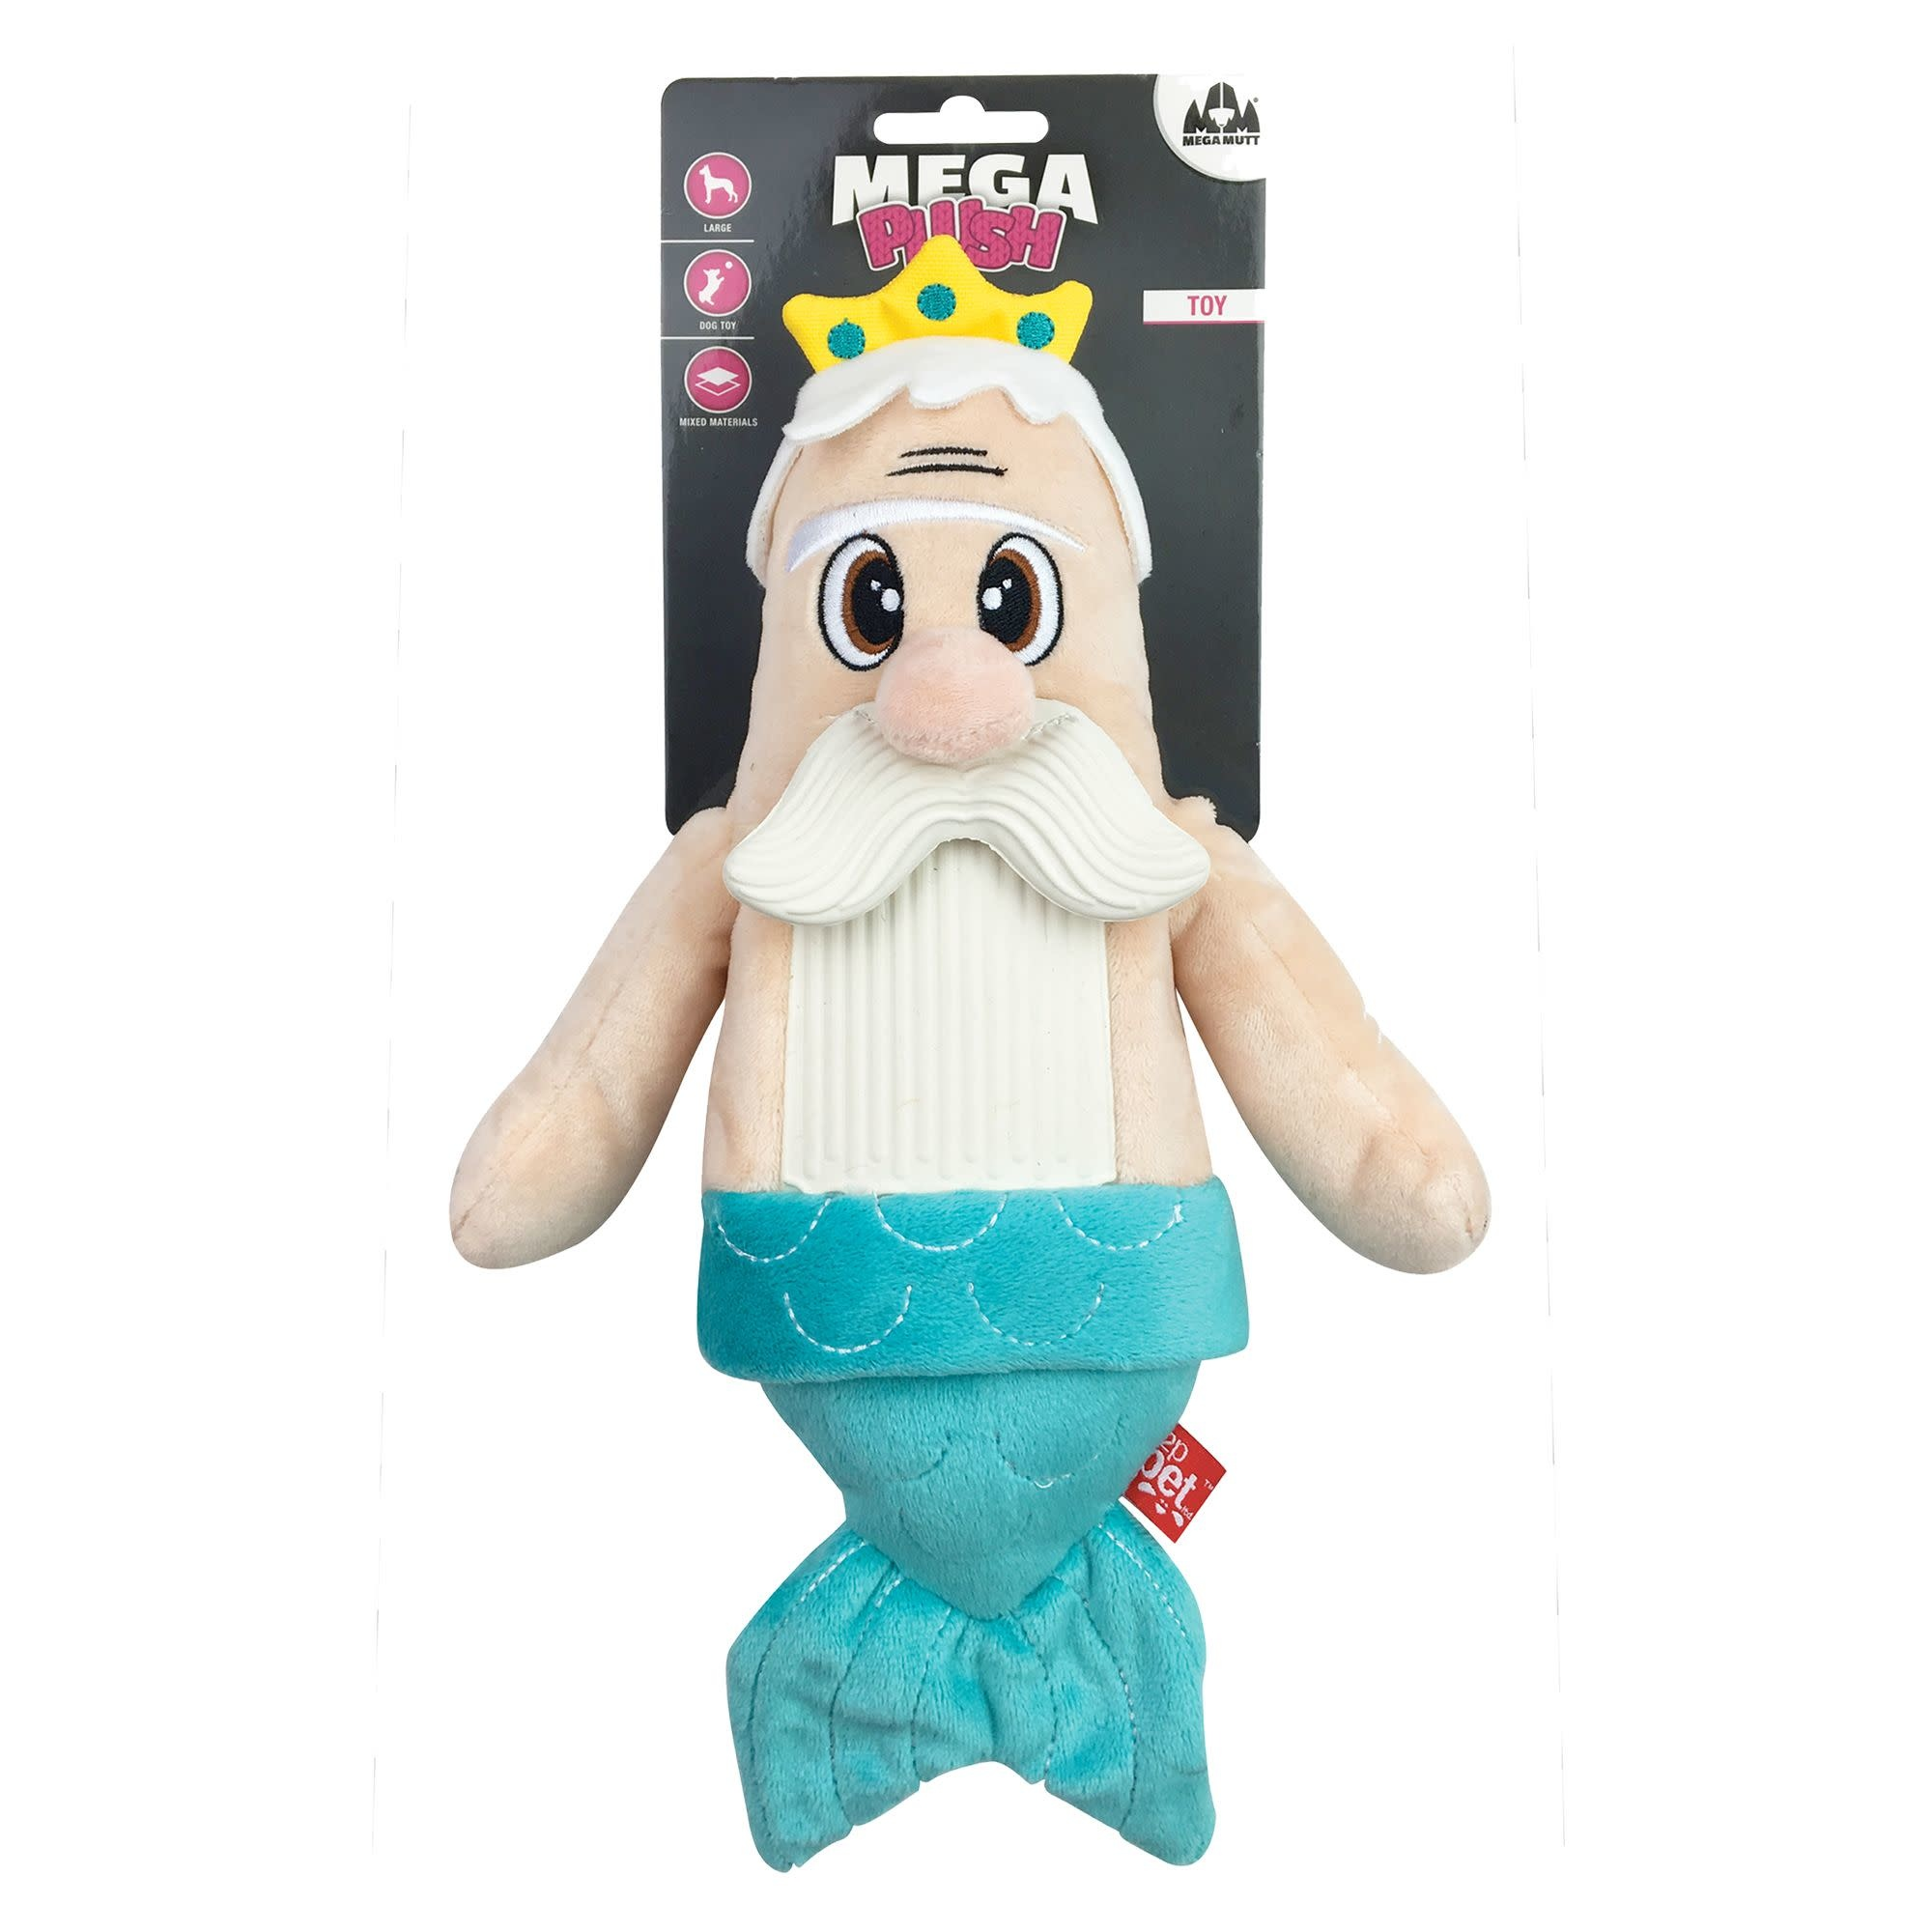 Bearded Buddies Plush Mermaid